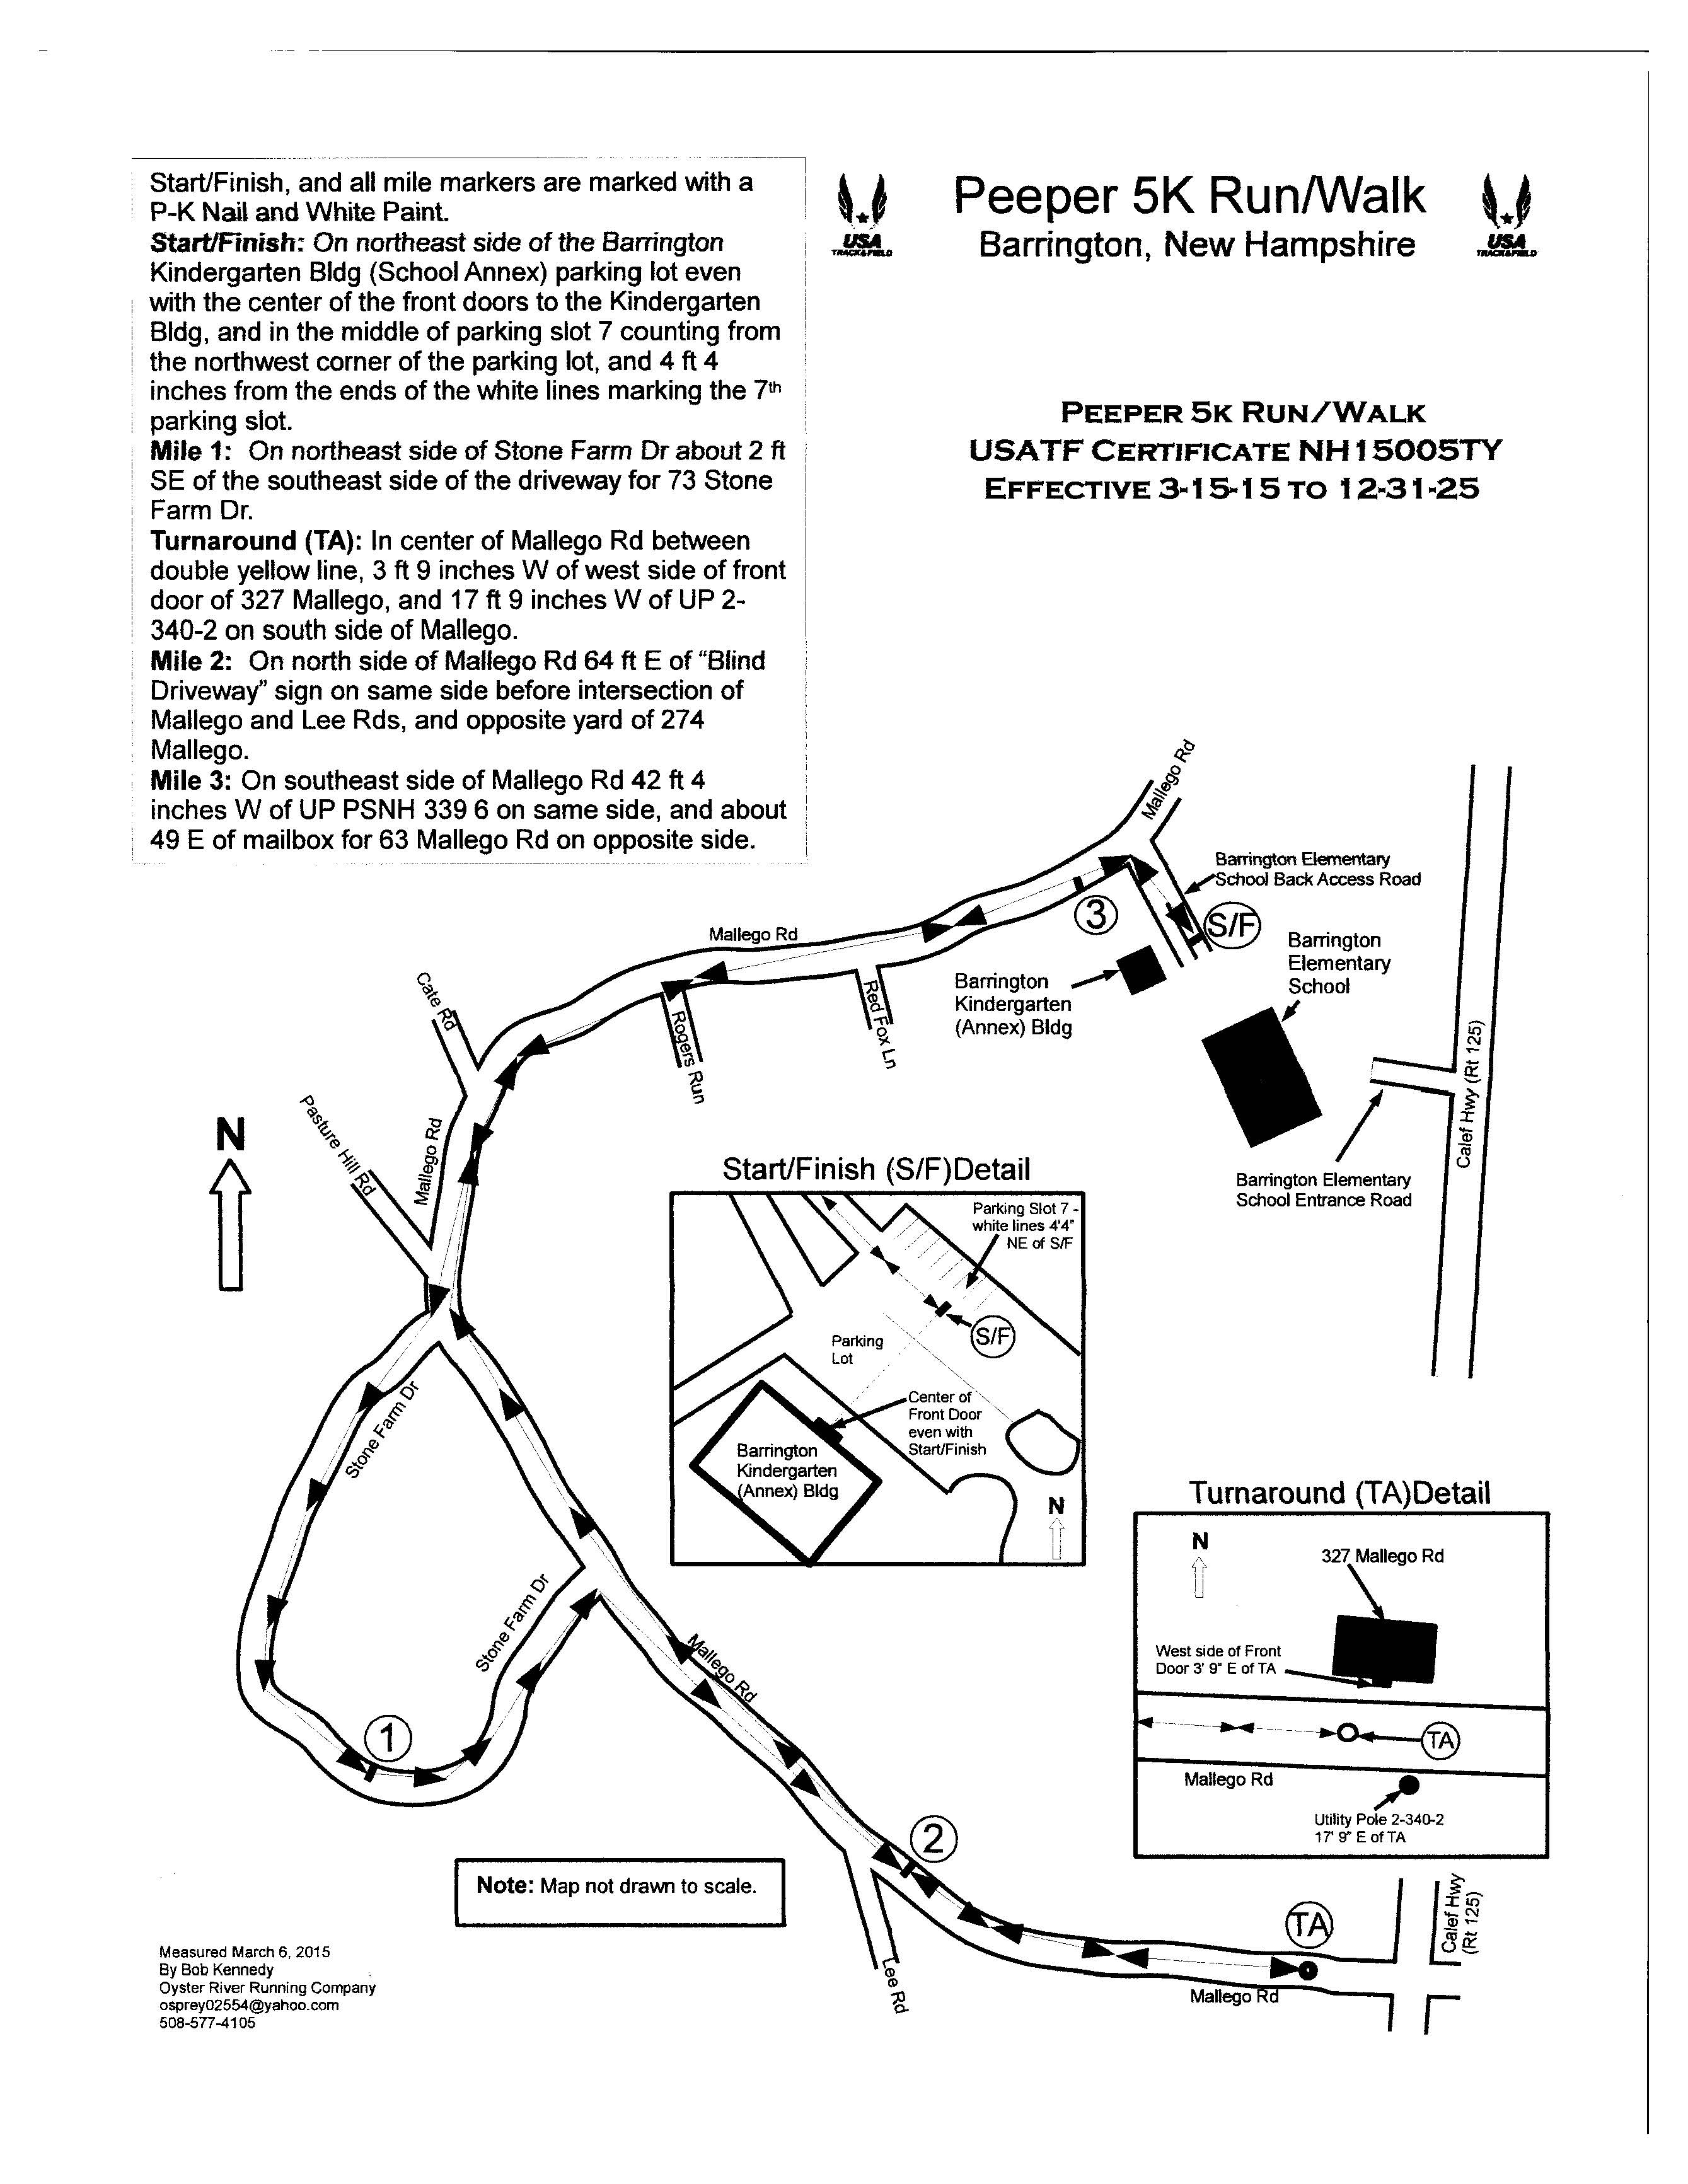 24th Annual Peeper 5K Run/Walk